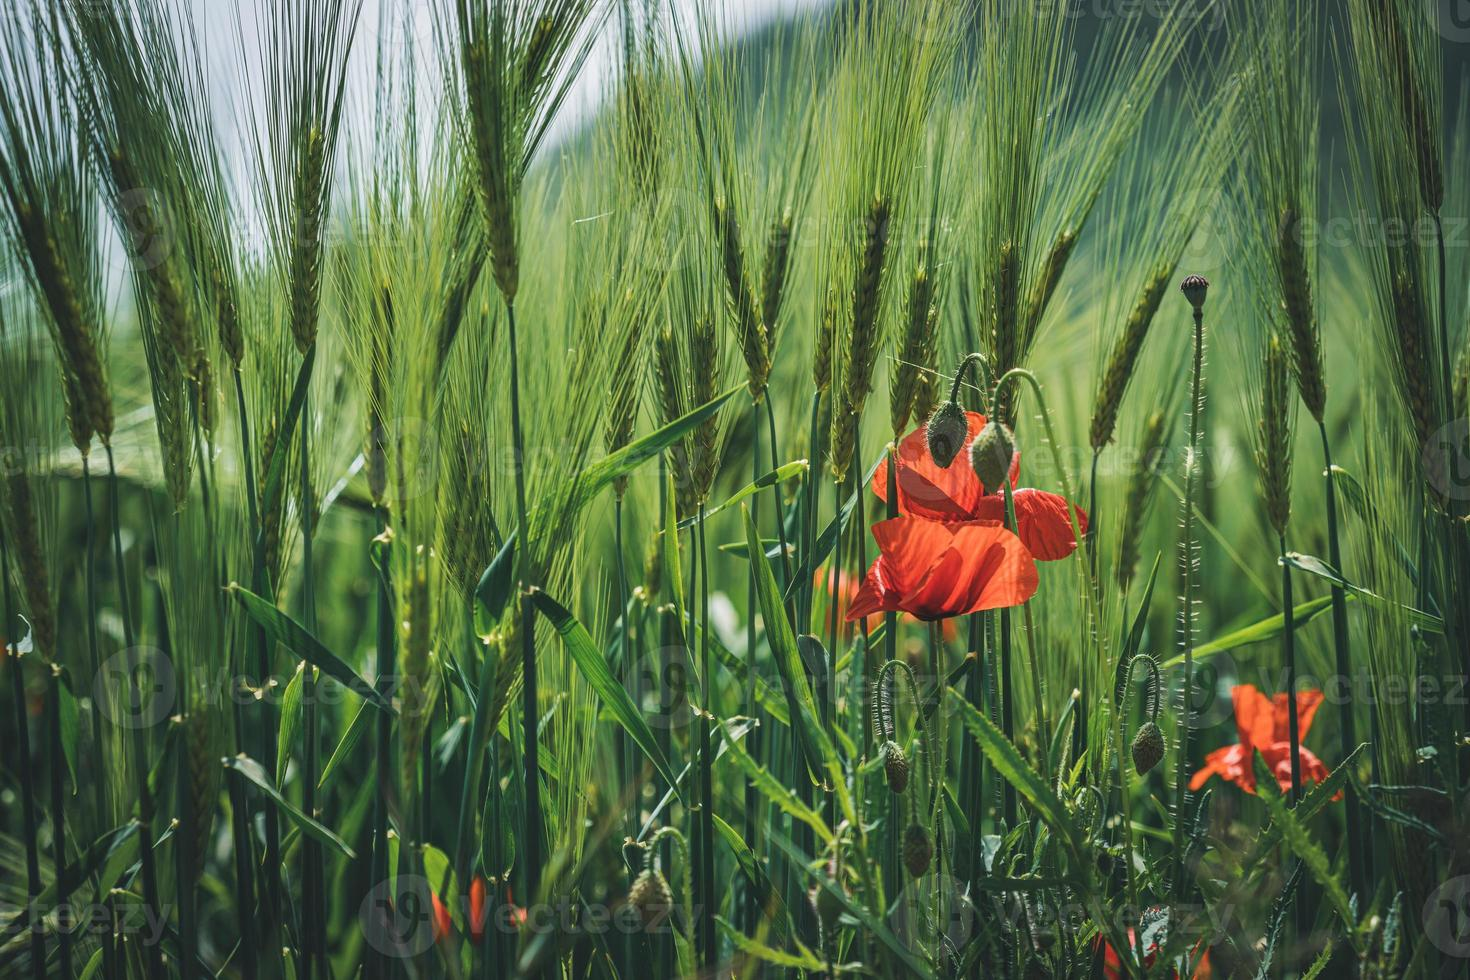 flores de papoula entre espigas verdes de trigo foto